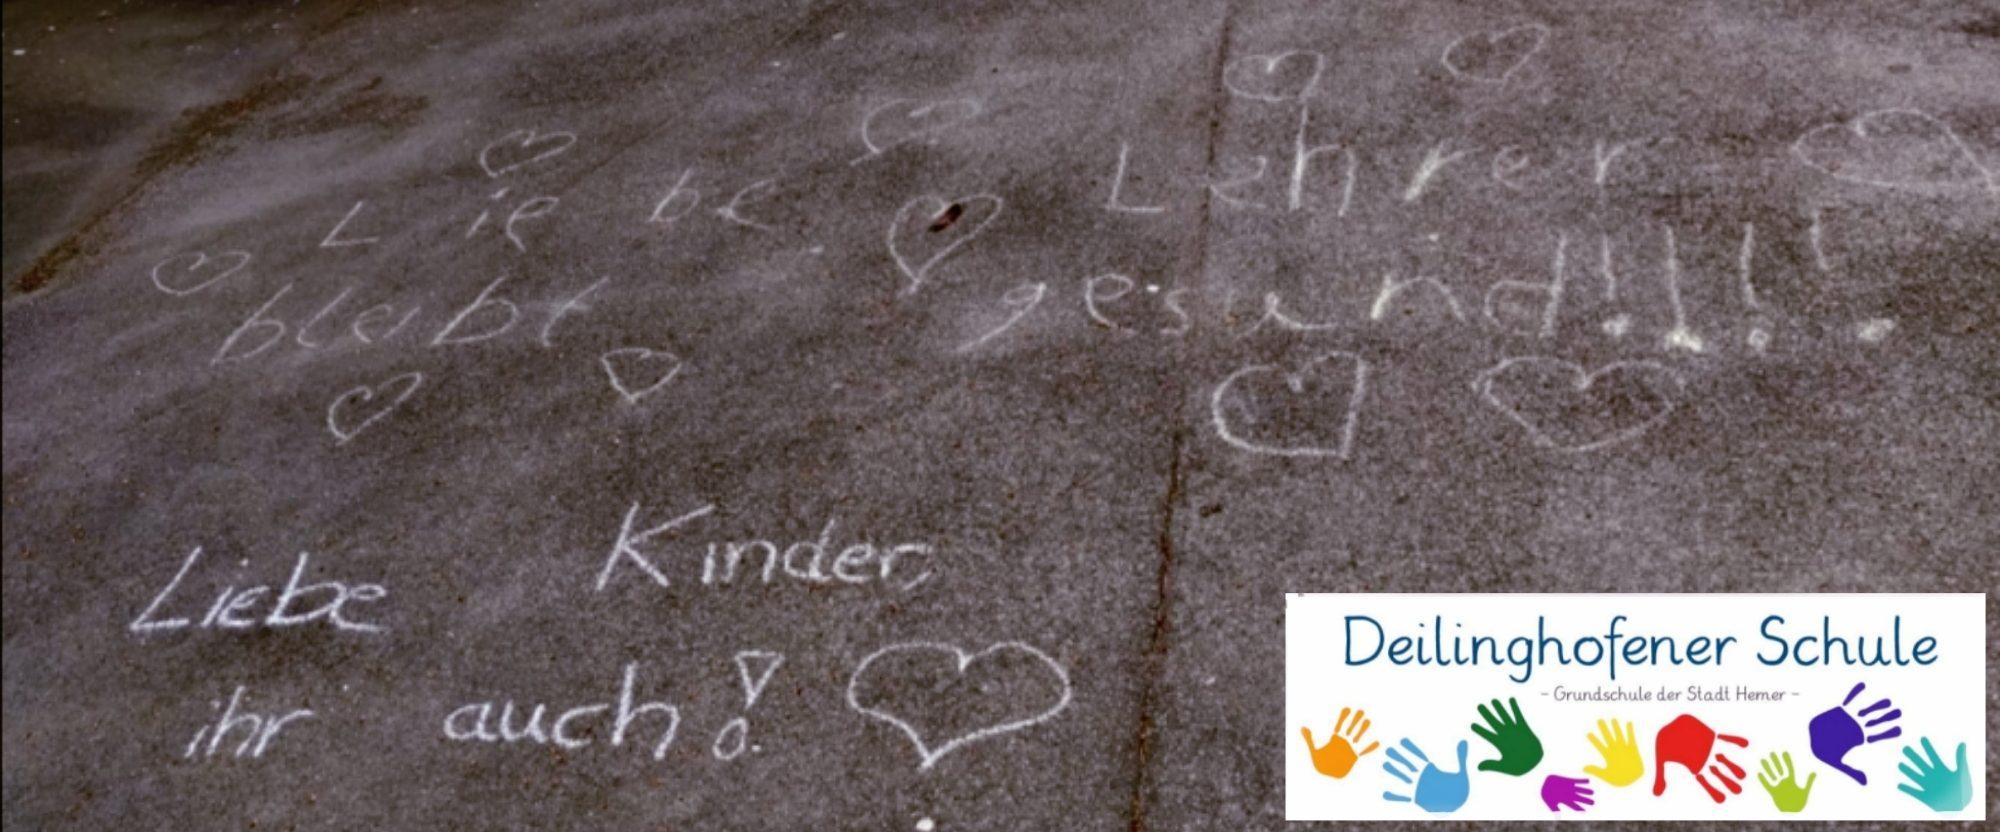 Deilinghofener Schule